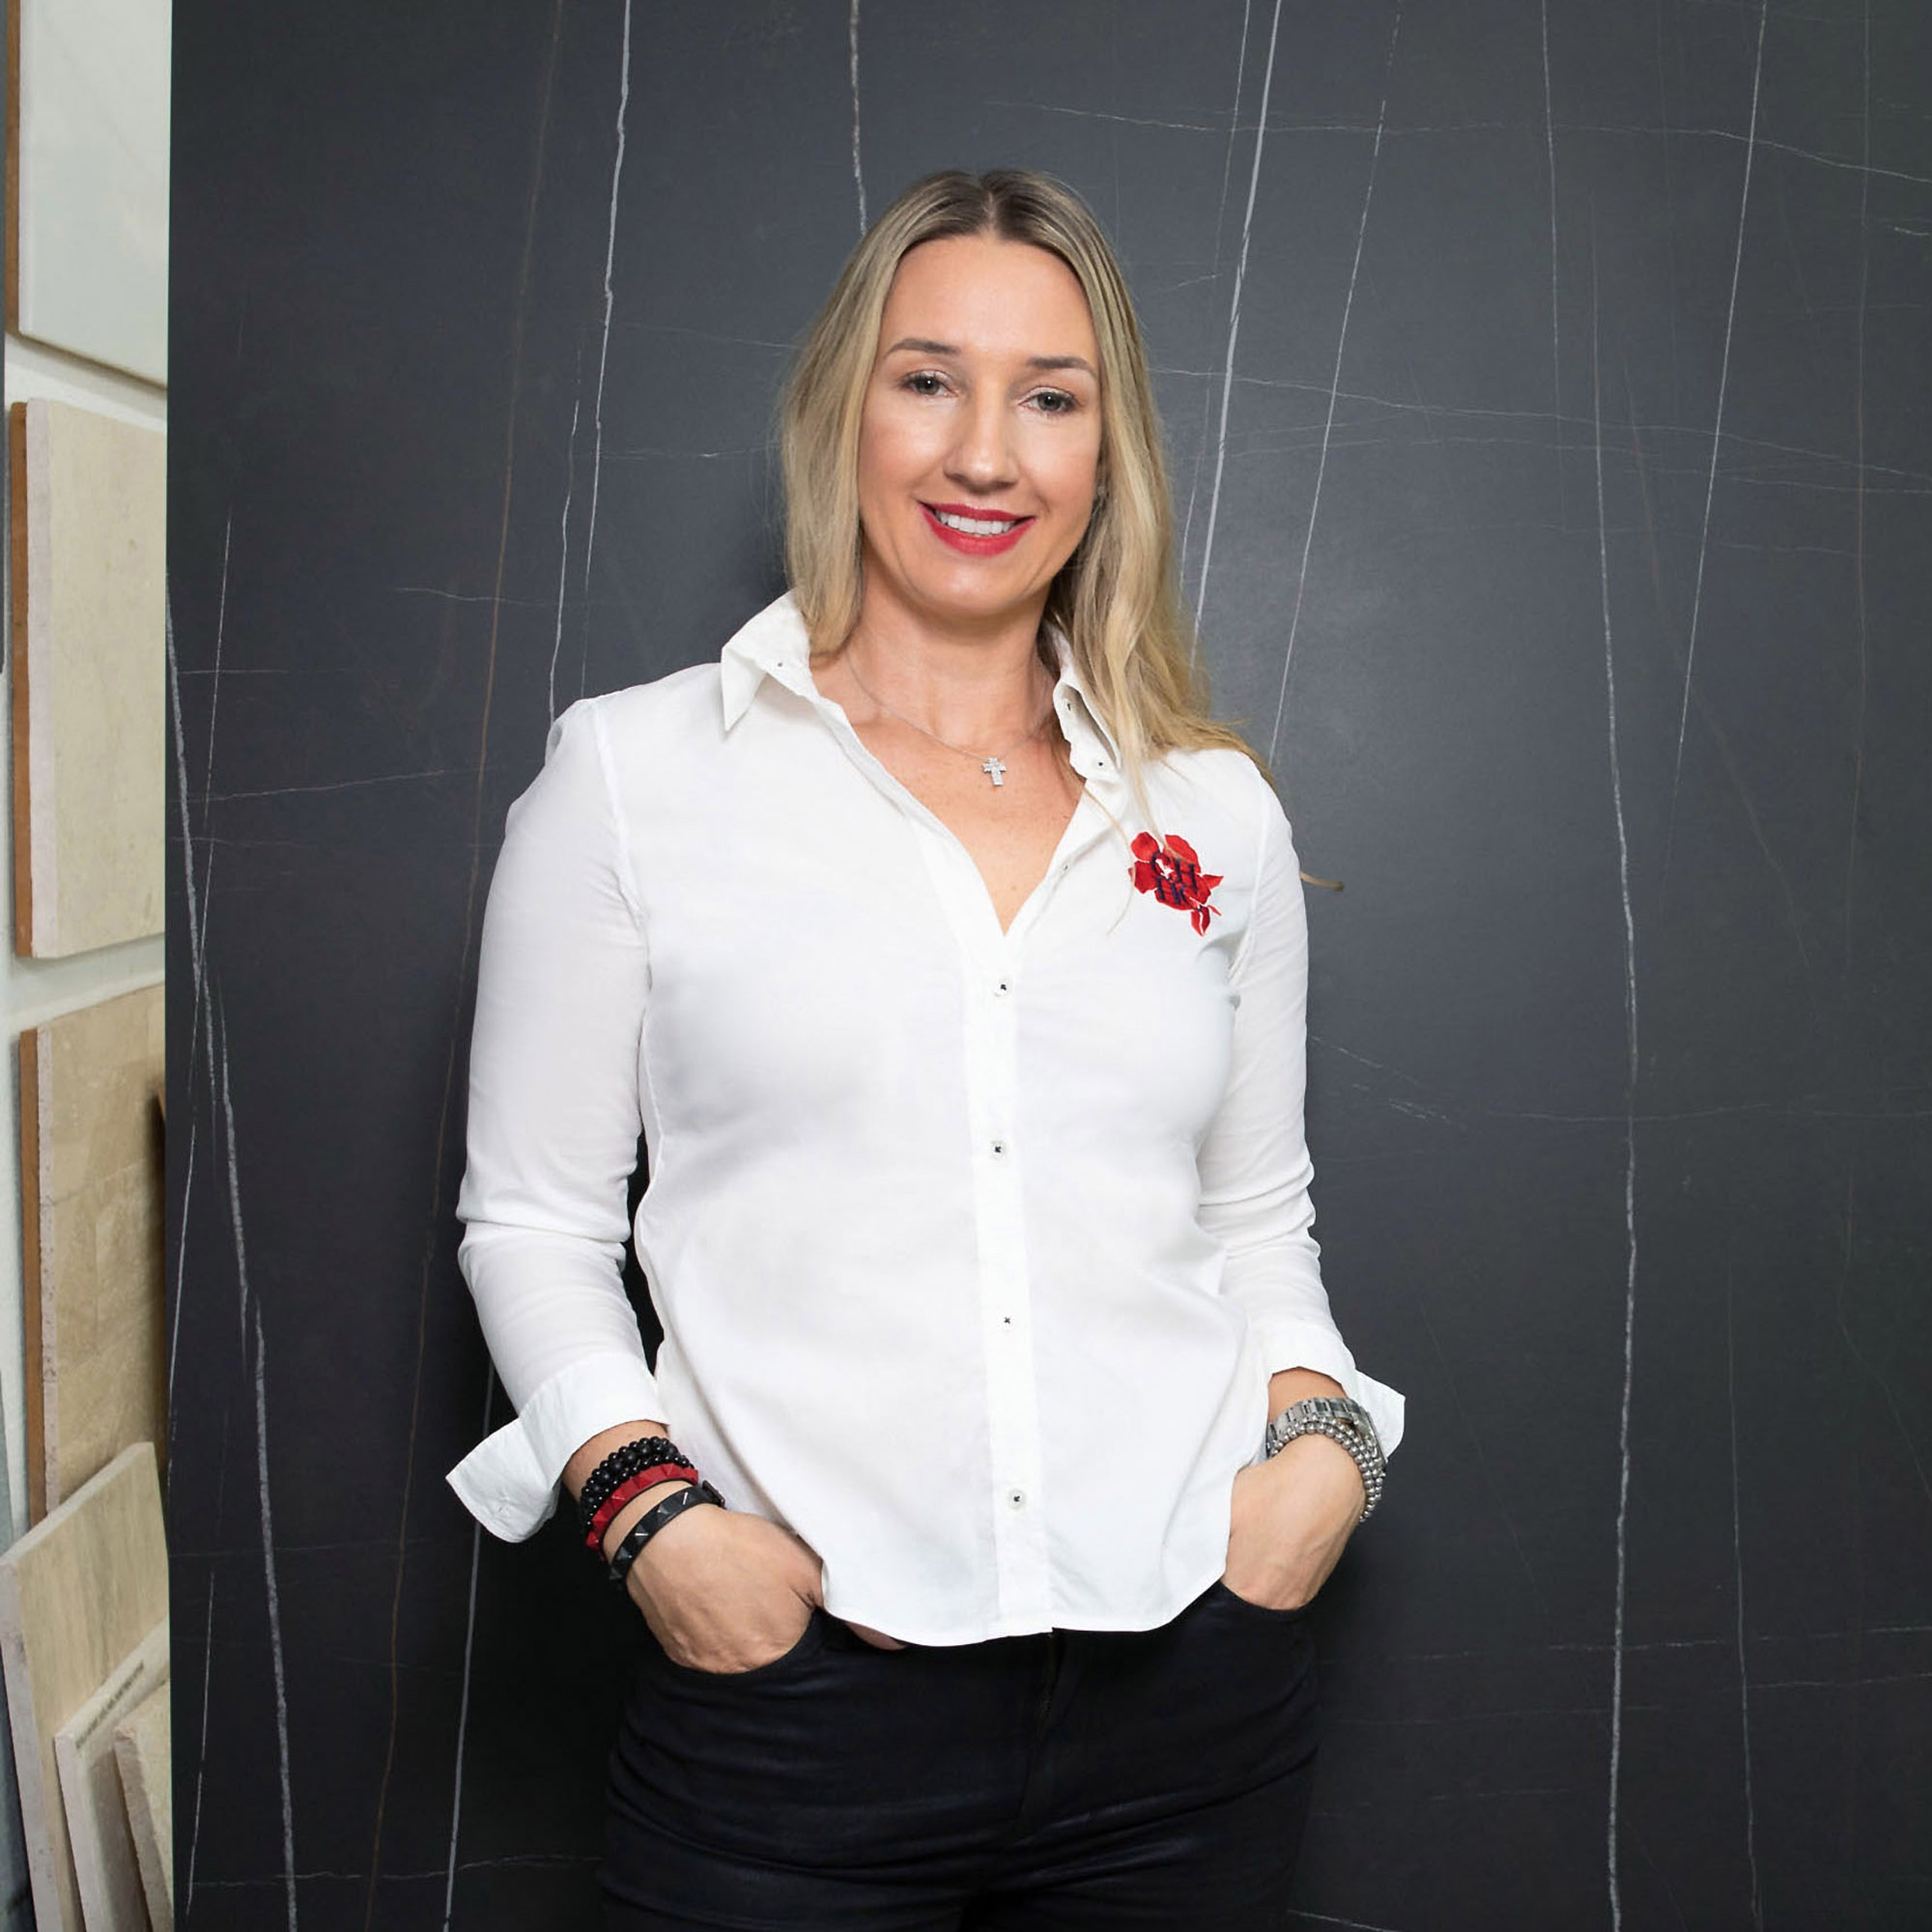 Bettina Yuchimczuk | Sales Manager